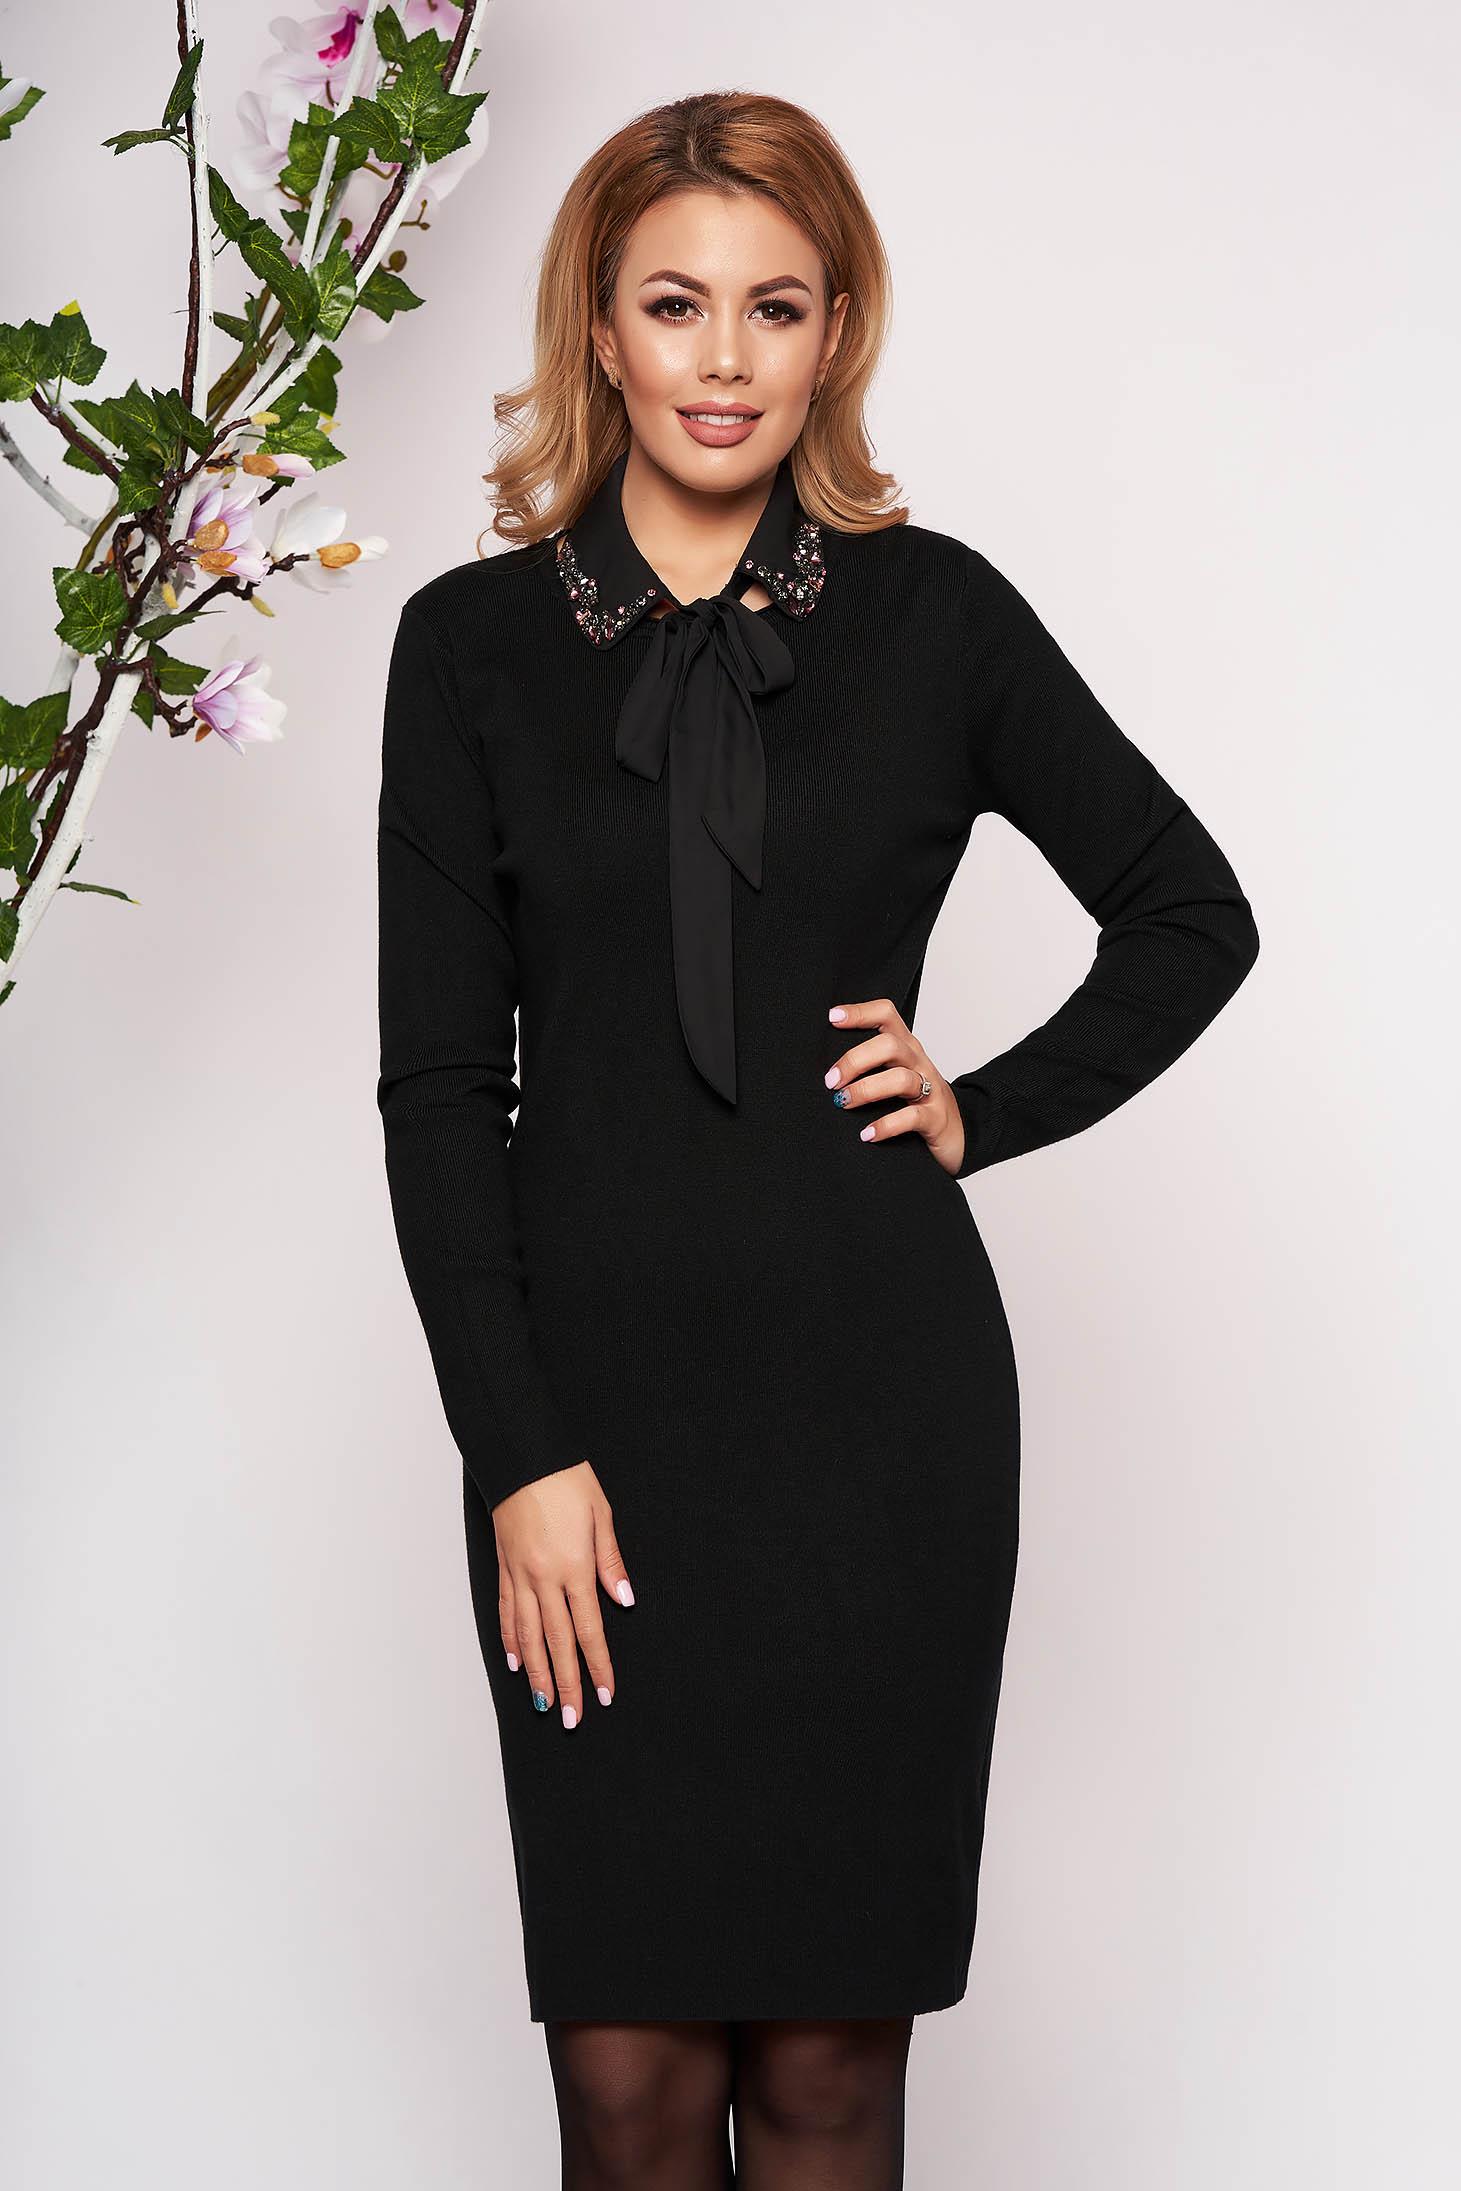 Rochie SunShine neagra eleganta tricotata tip creion cu maneci lungi guler detasabil decolteu la baza gatului